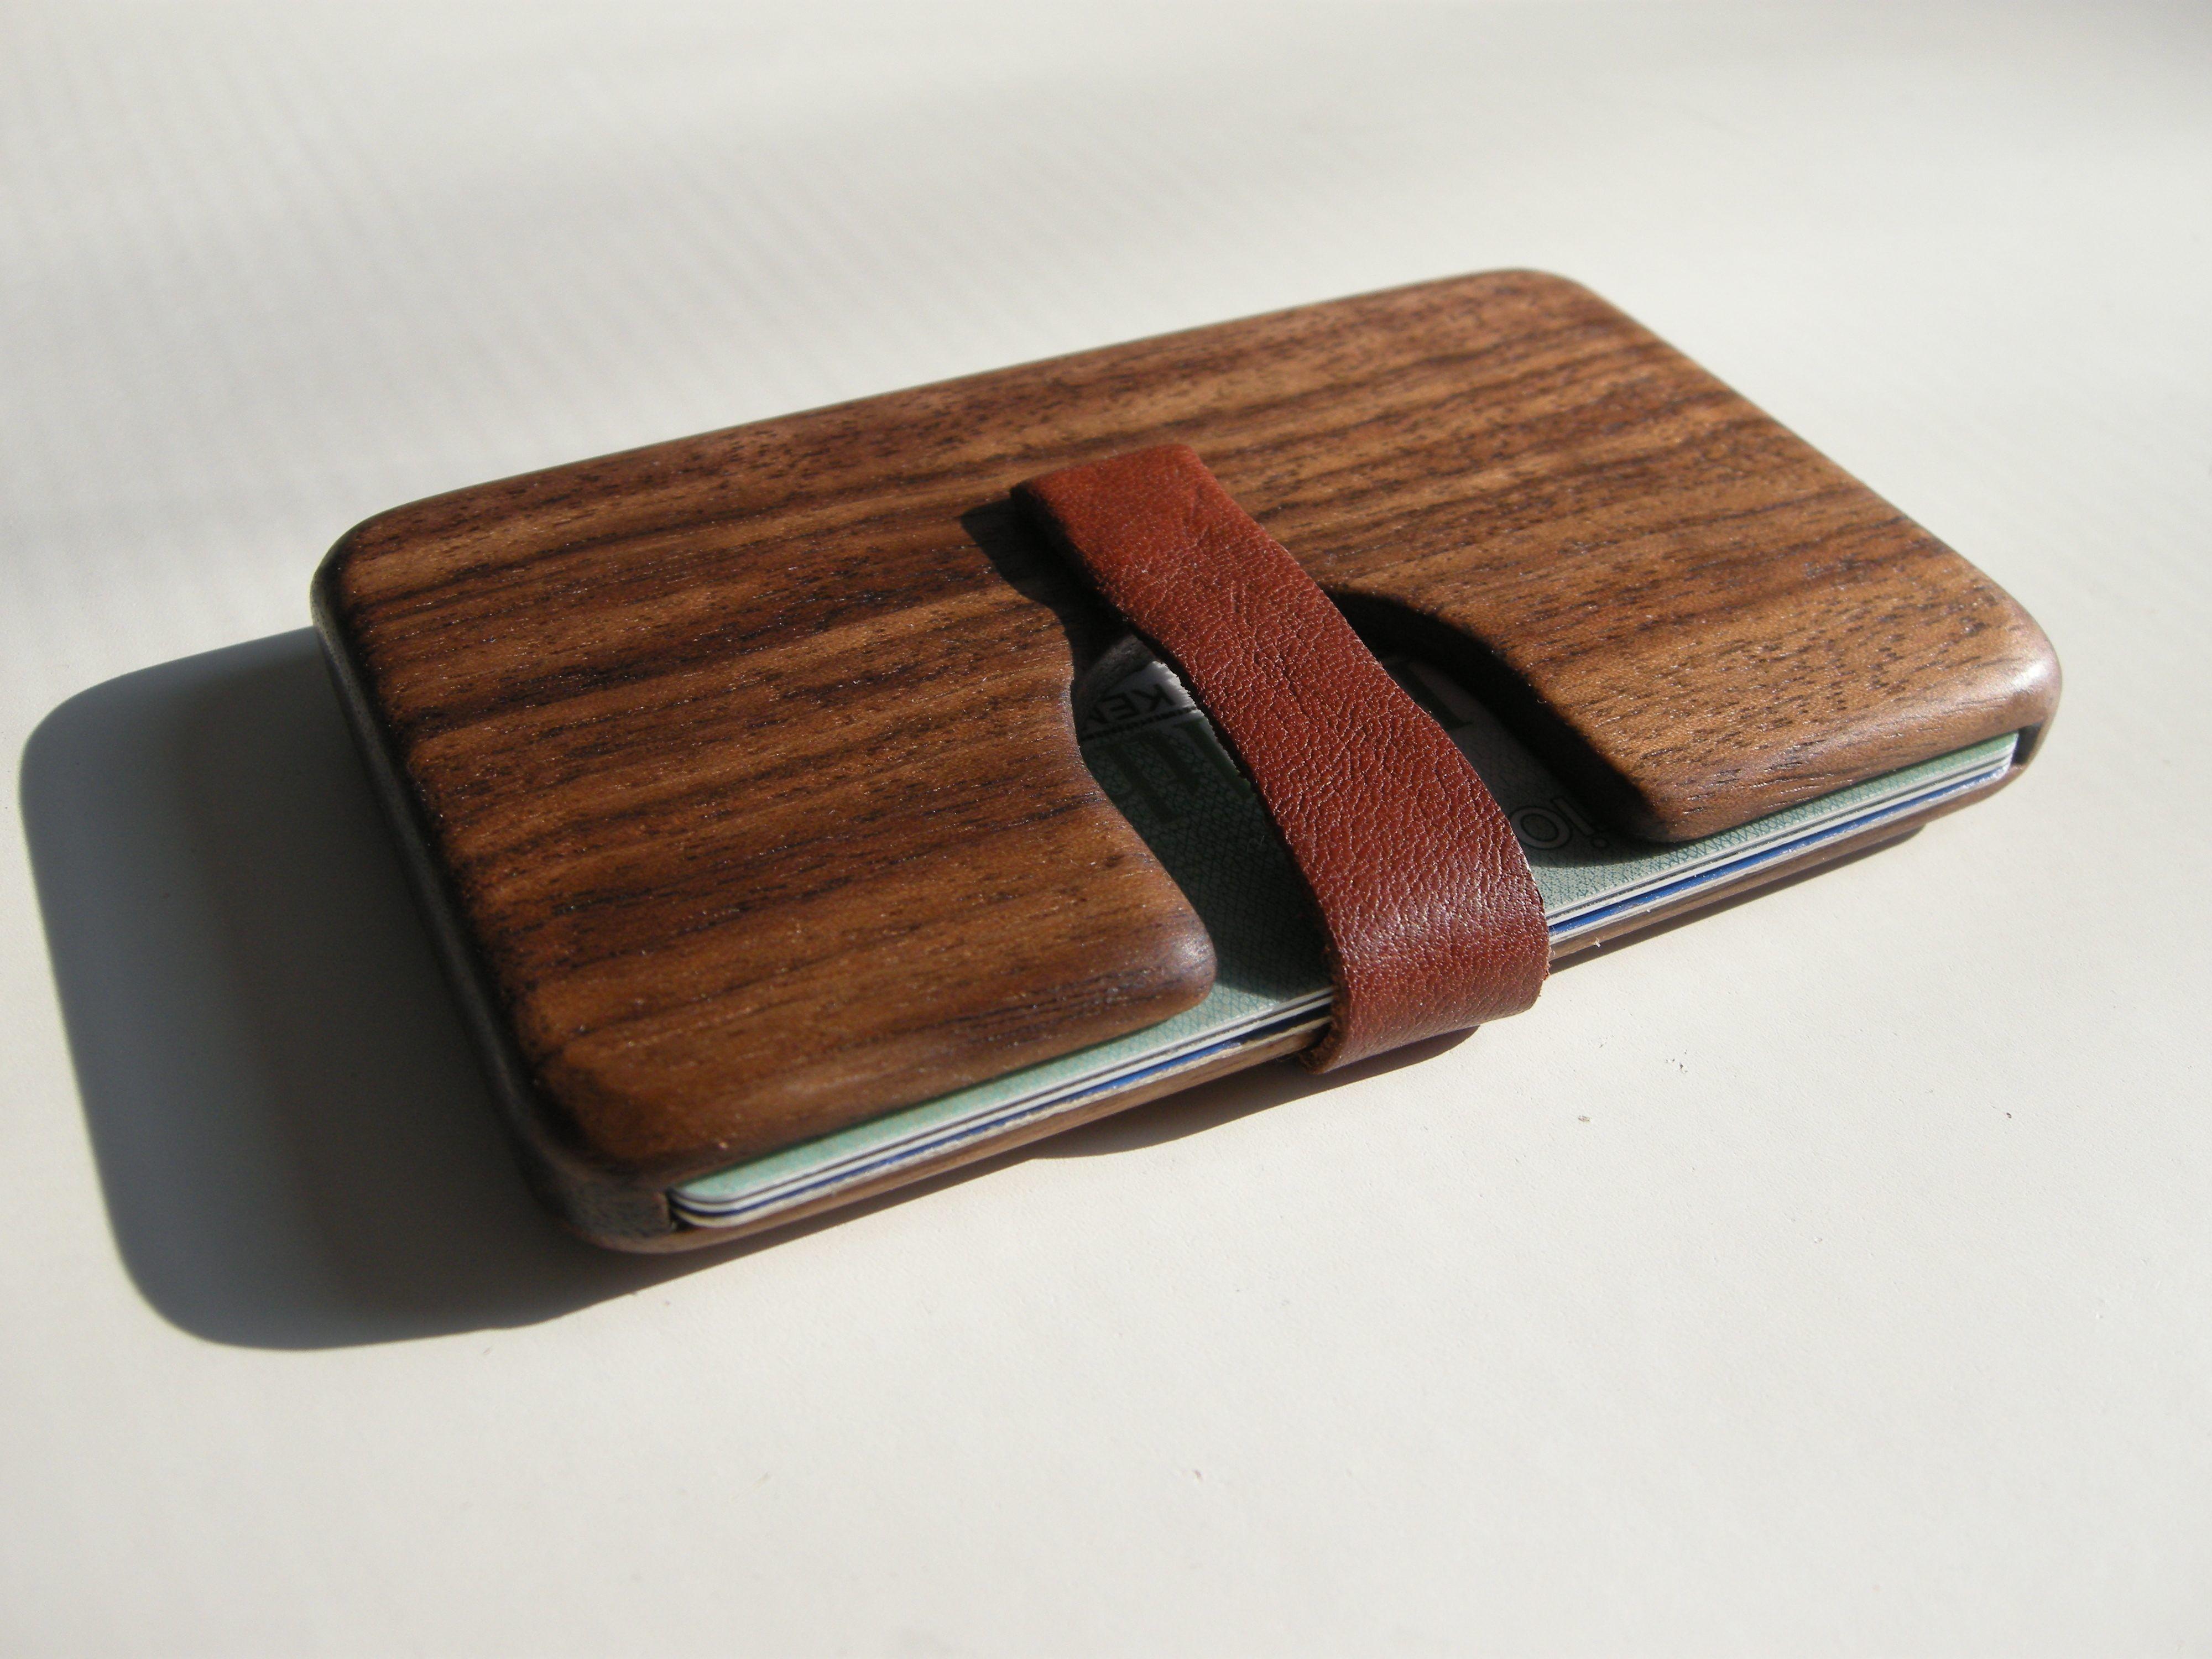 Wooden business card holder   Dobre nápady   Pinterest   Woods ...